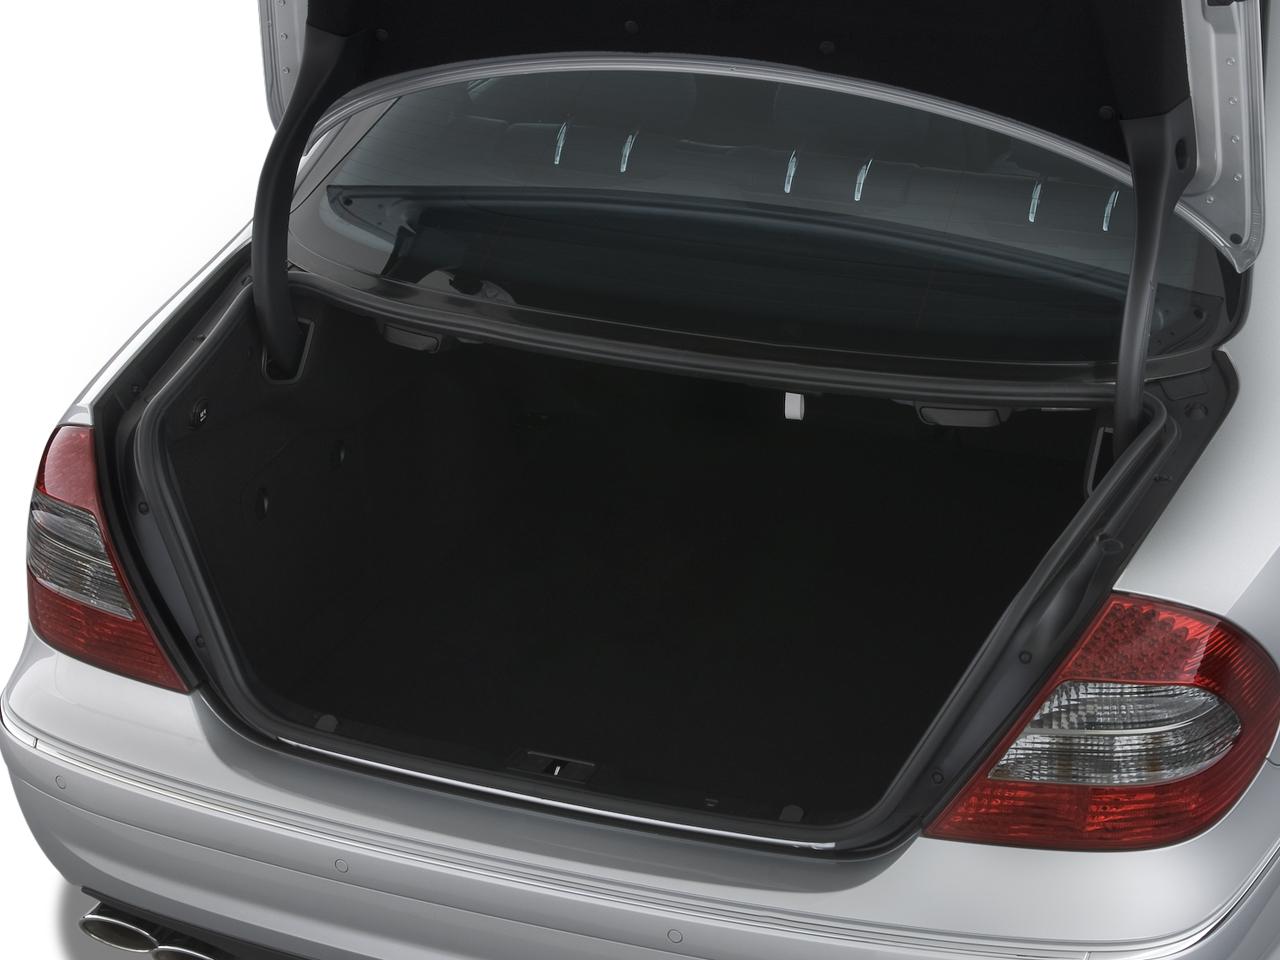 2009 mercedes benz e250 bluetec concept 2009 new york for How to open the trunk of a mercedes benz e320